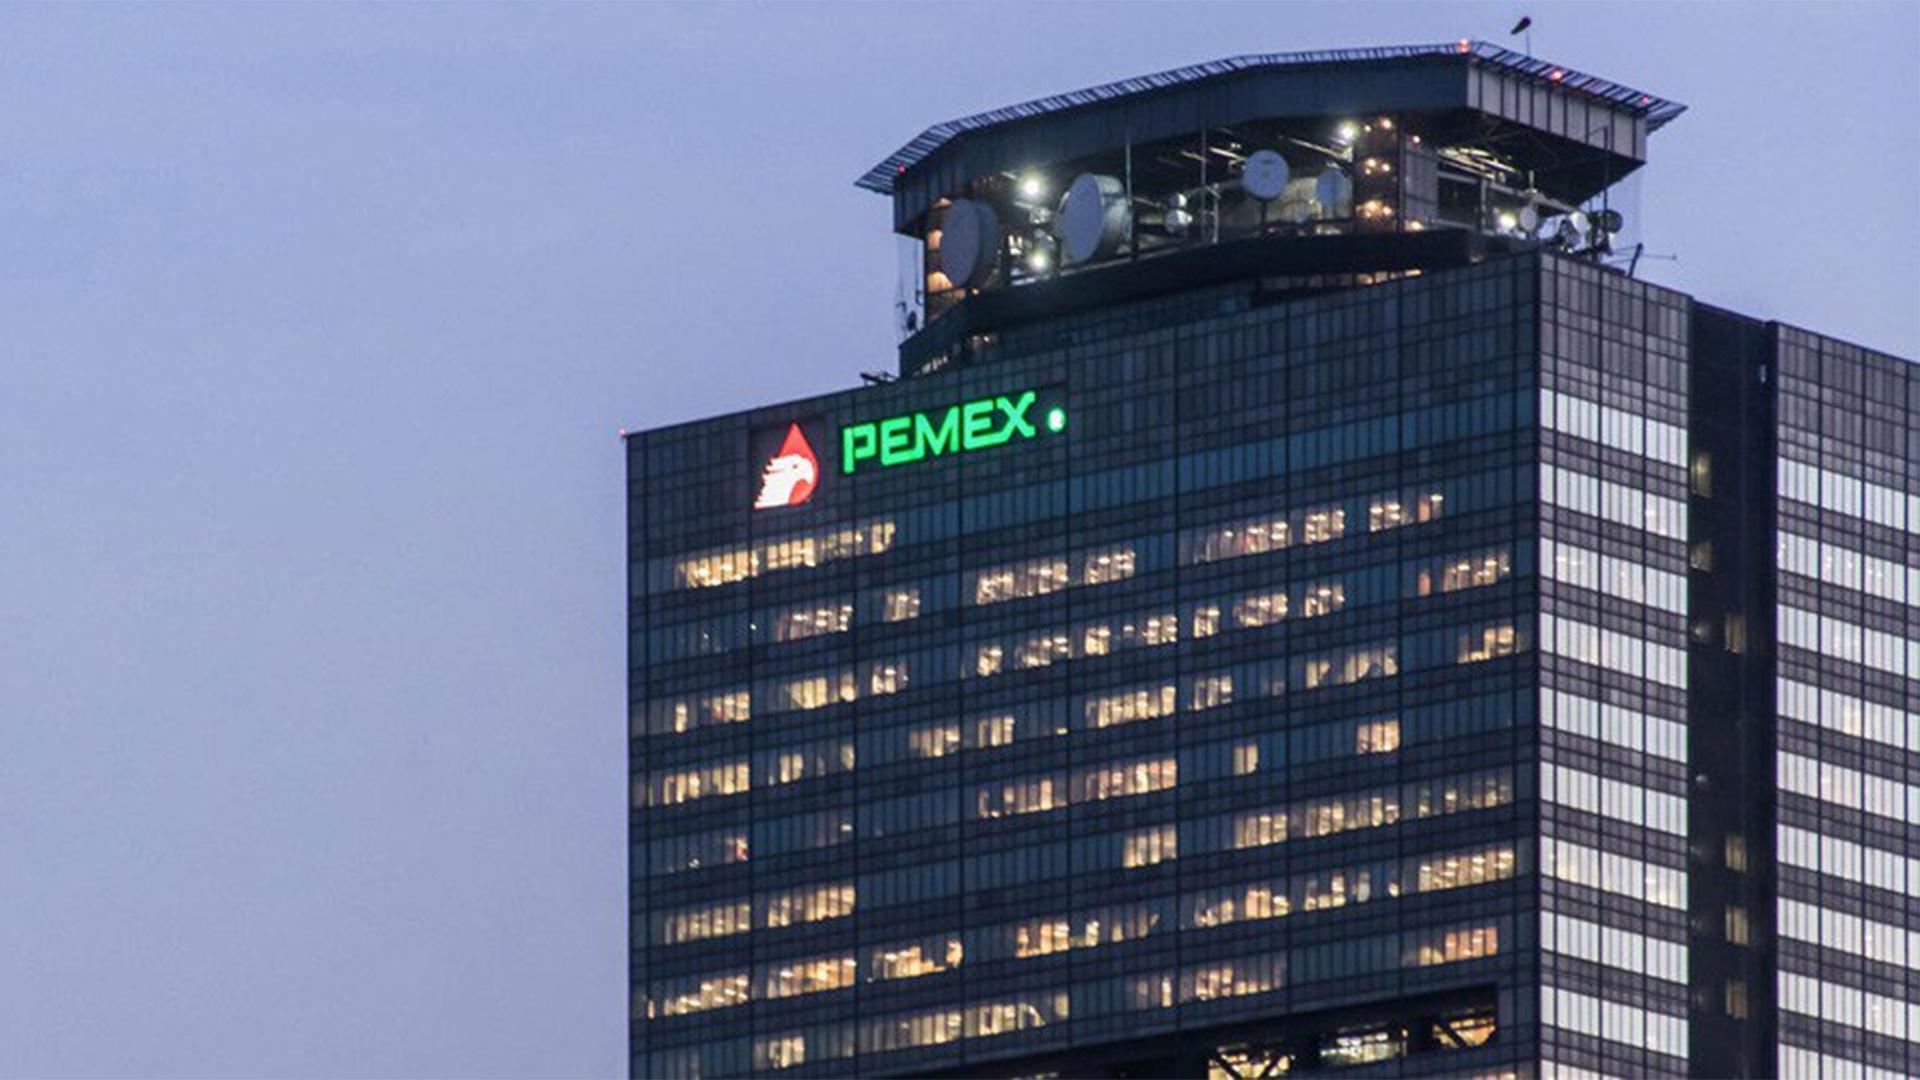 La empresa petrolera mexicana presenta cifras negativas (@PrensaOaxaca2)